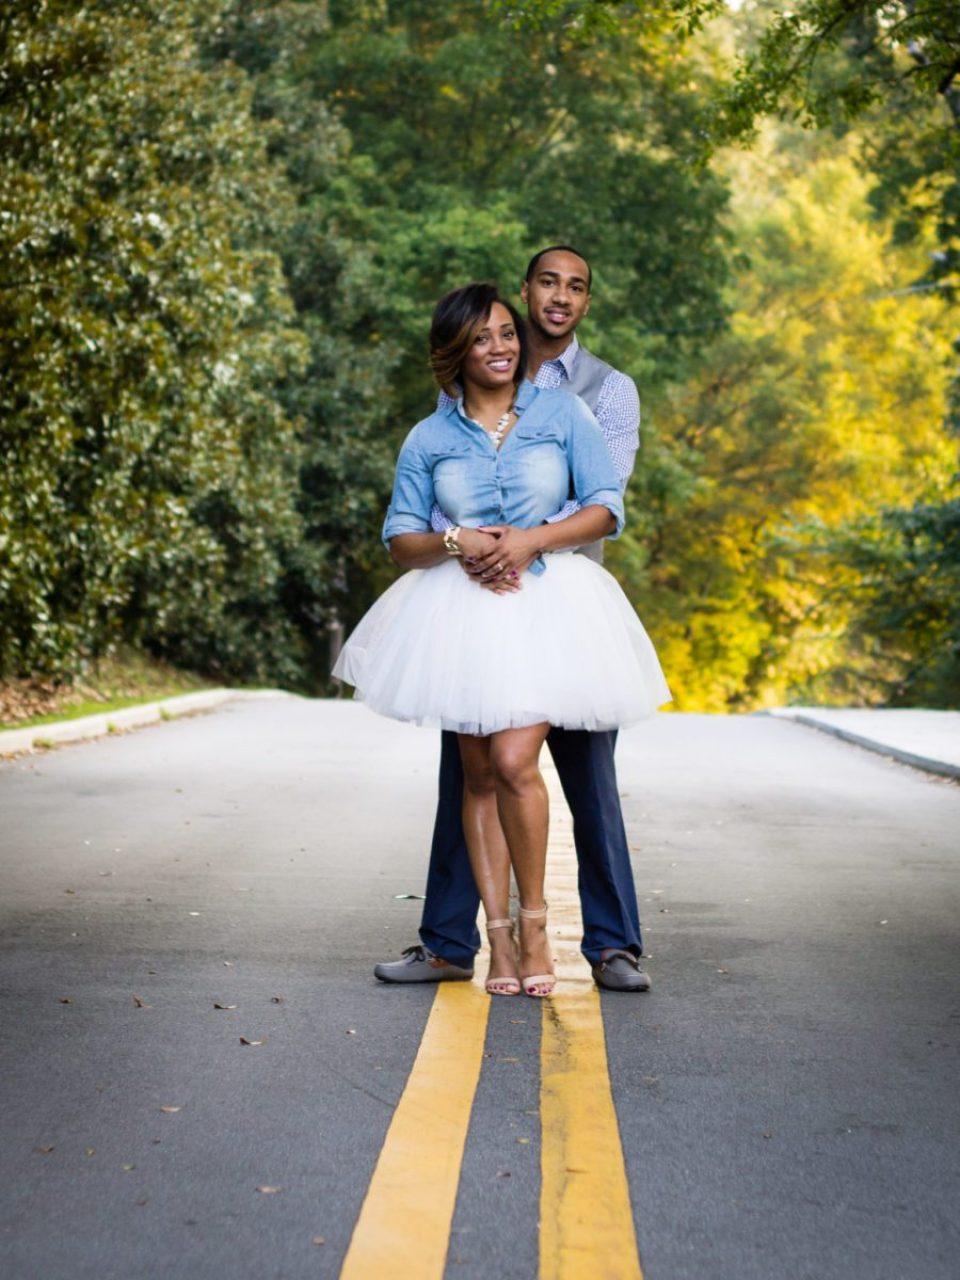 AD9-960x1280 Amber and Andrew, Atlanta Love